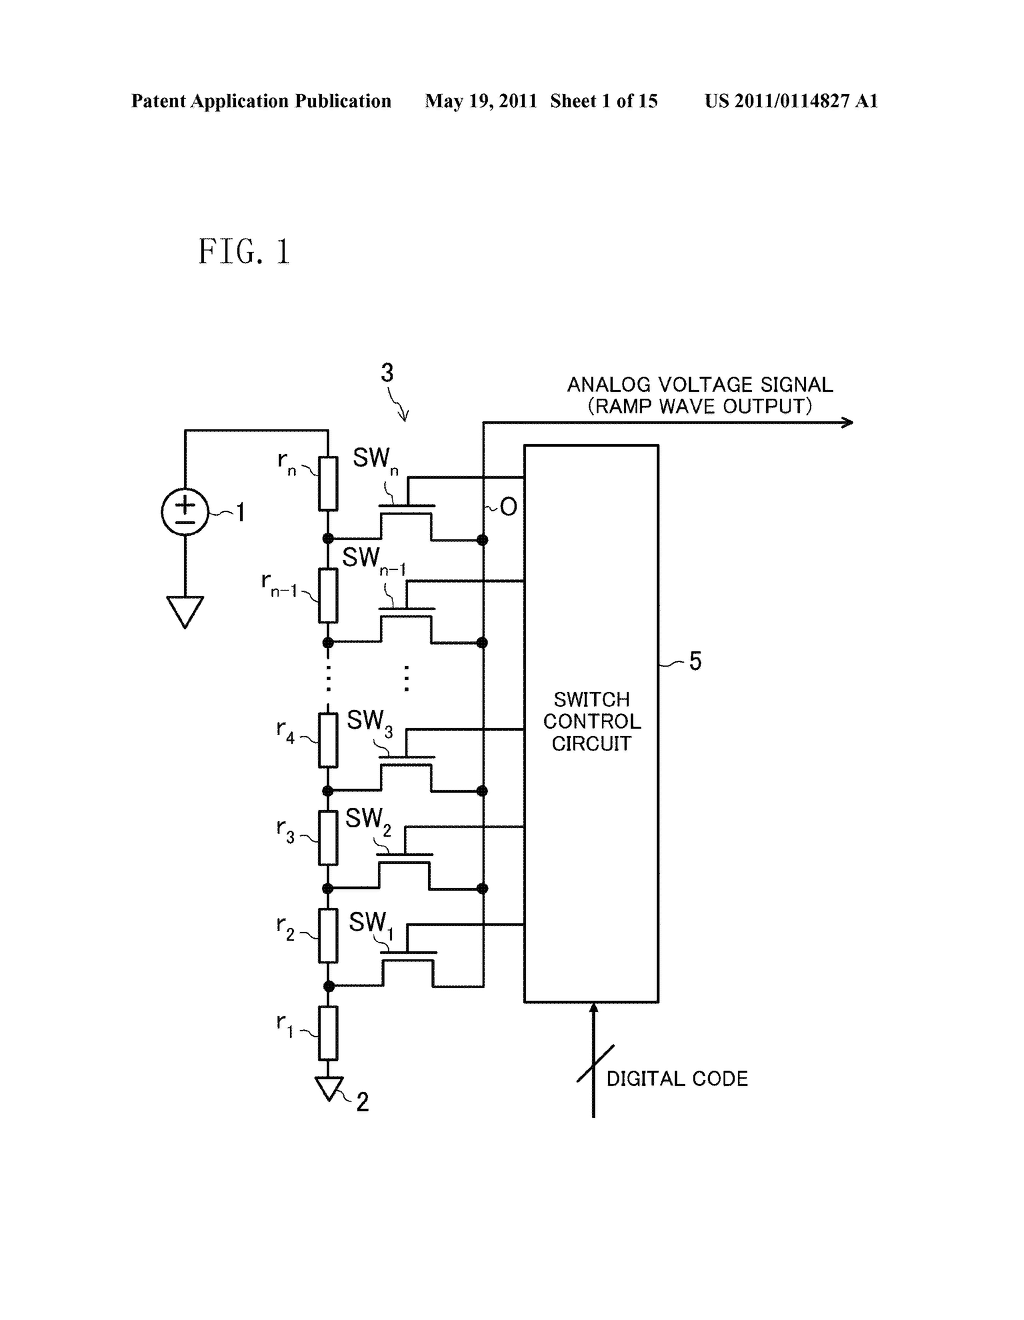 Ramp Generator Circuit Digital Diagram Symbols High Voltage To Analog Converter Rh Patentsencyclopedia Com Simple Sawtooth Wave